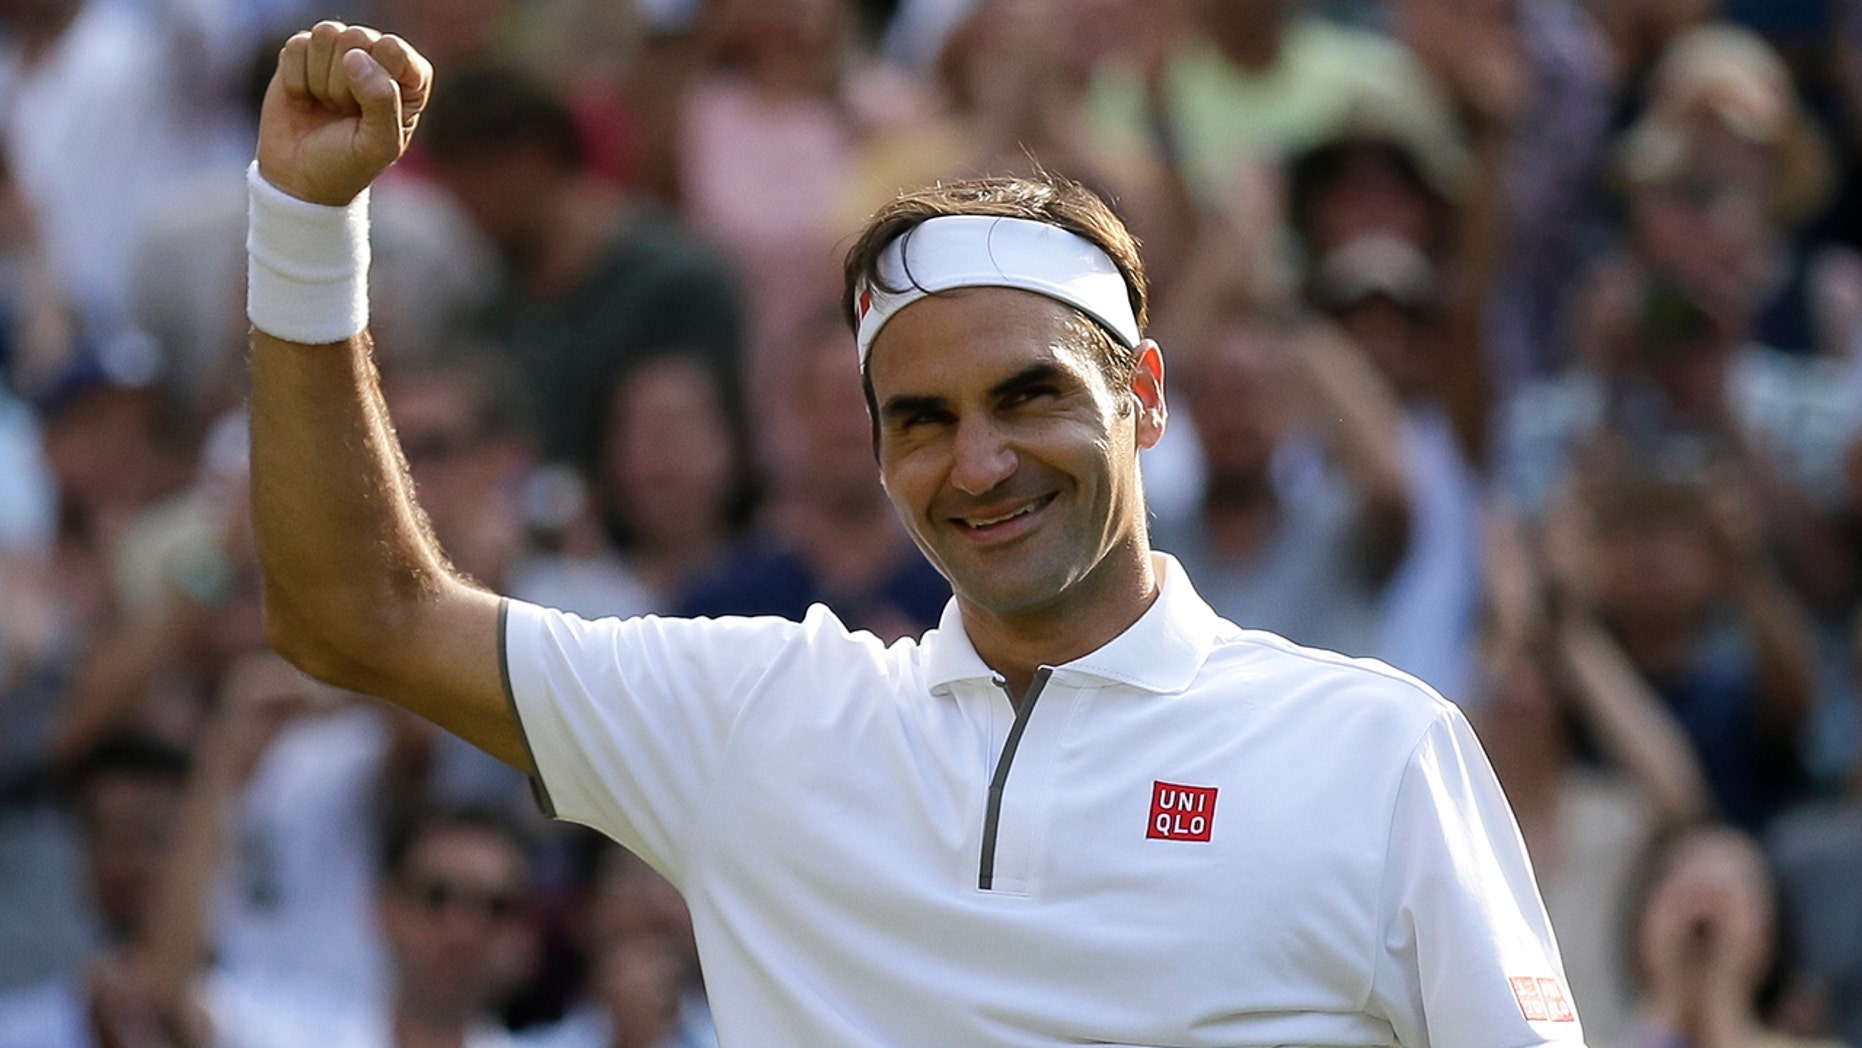 Switzerland's Roger Federer celebrates defeating Japan's Kei Nishikori during a men's quarterfinal compare on day 9 of a Wimbledon Tennis Championships in London, Wednesday, Jul 10, 2019. (AP Photo/Tim Ireland)